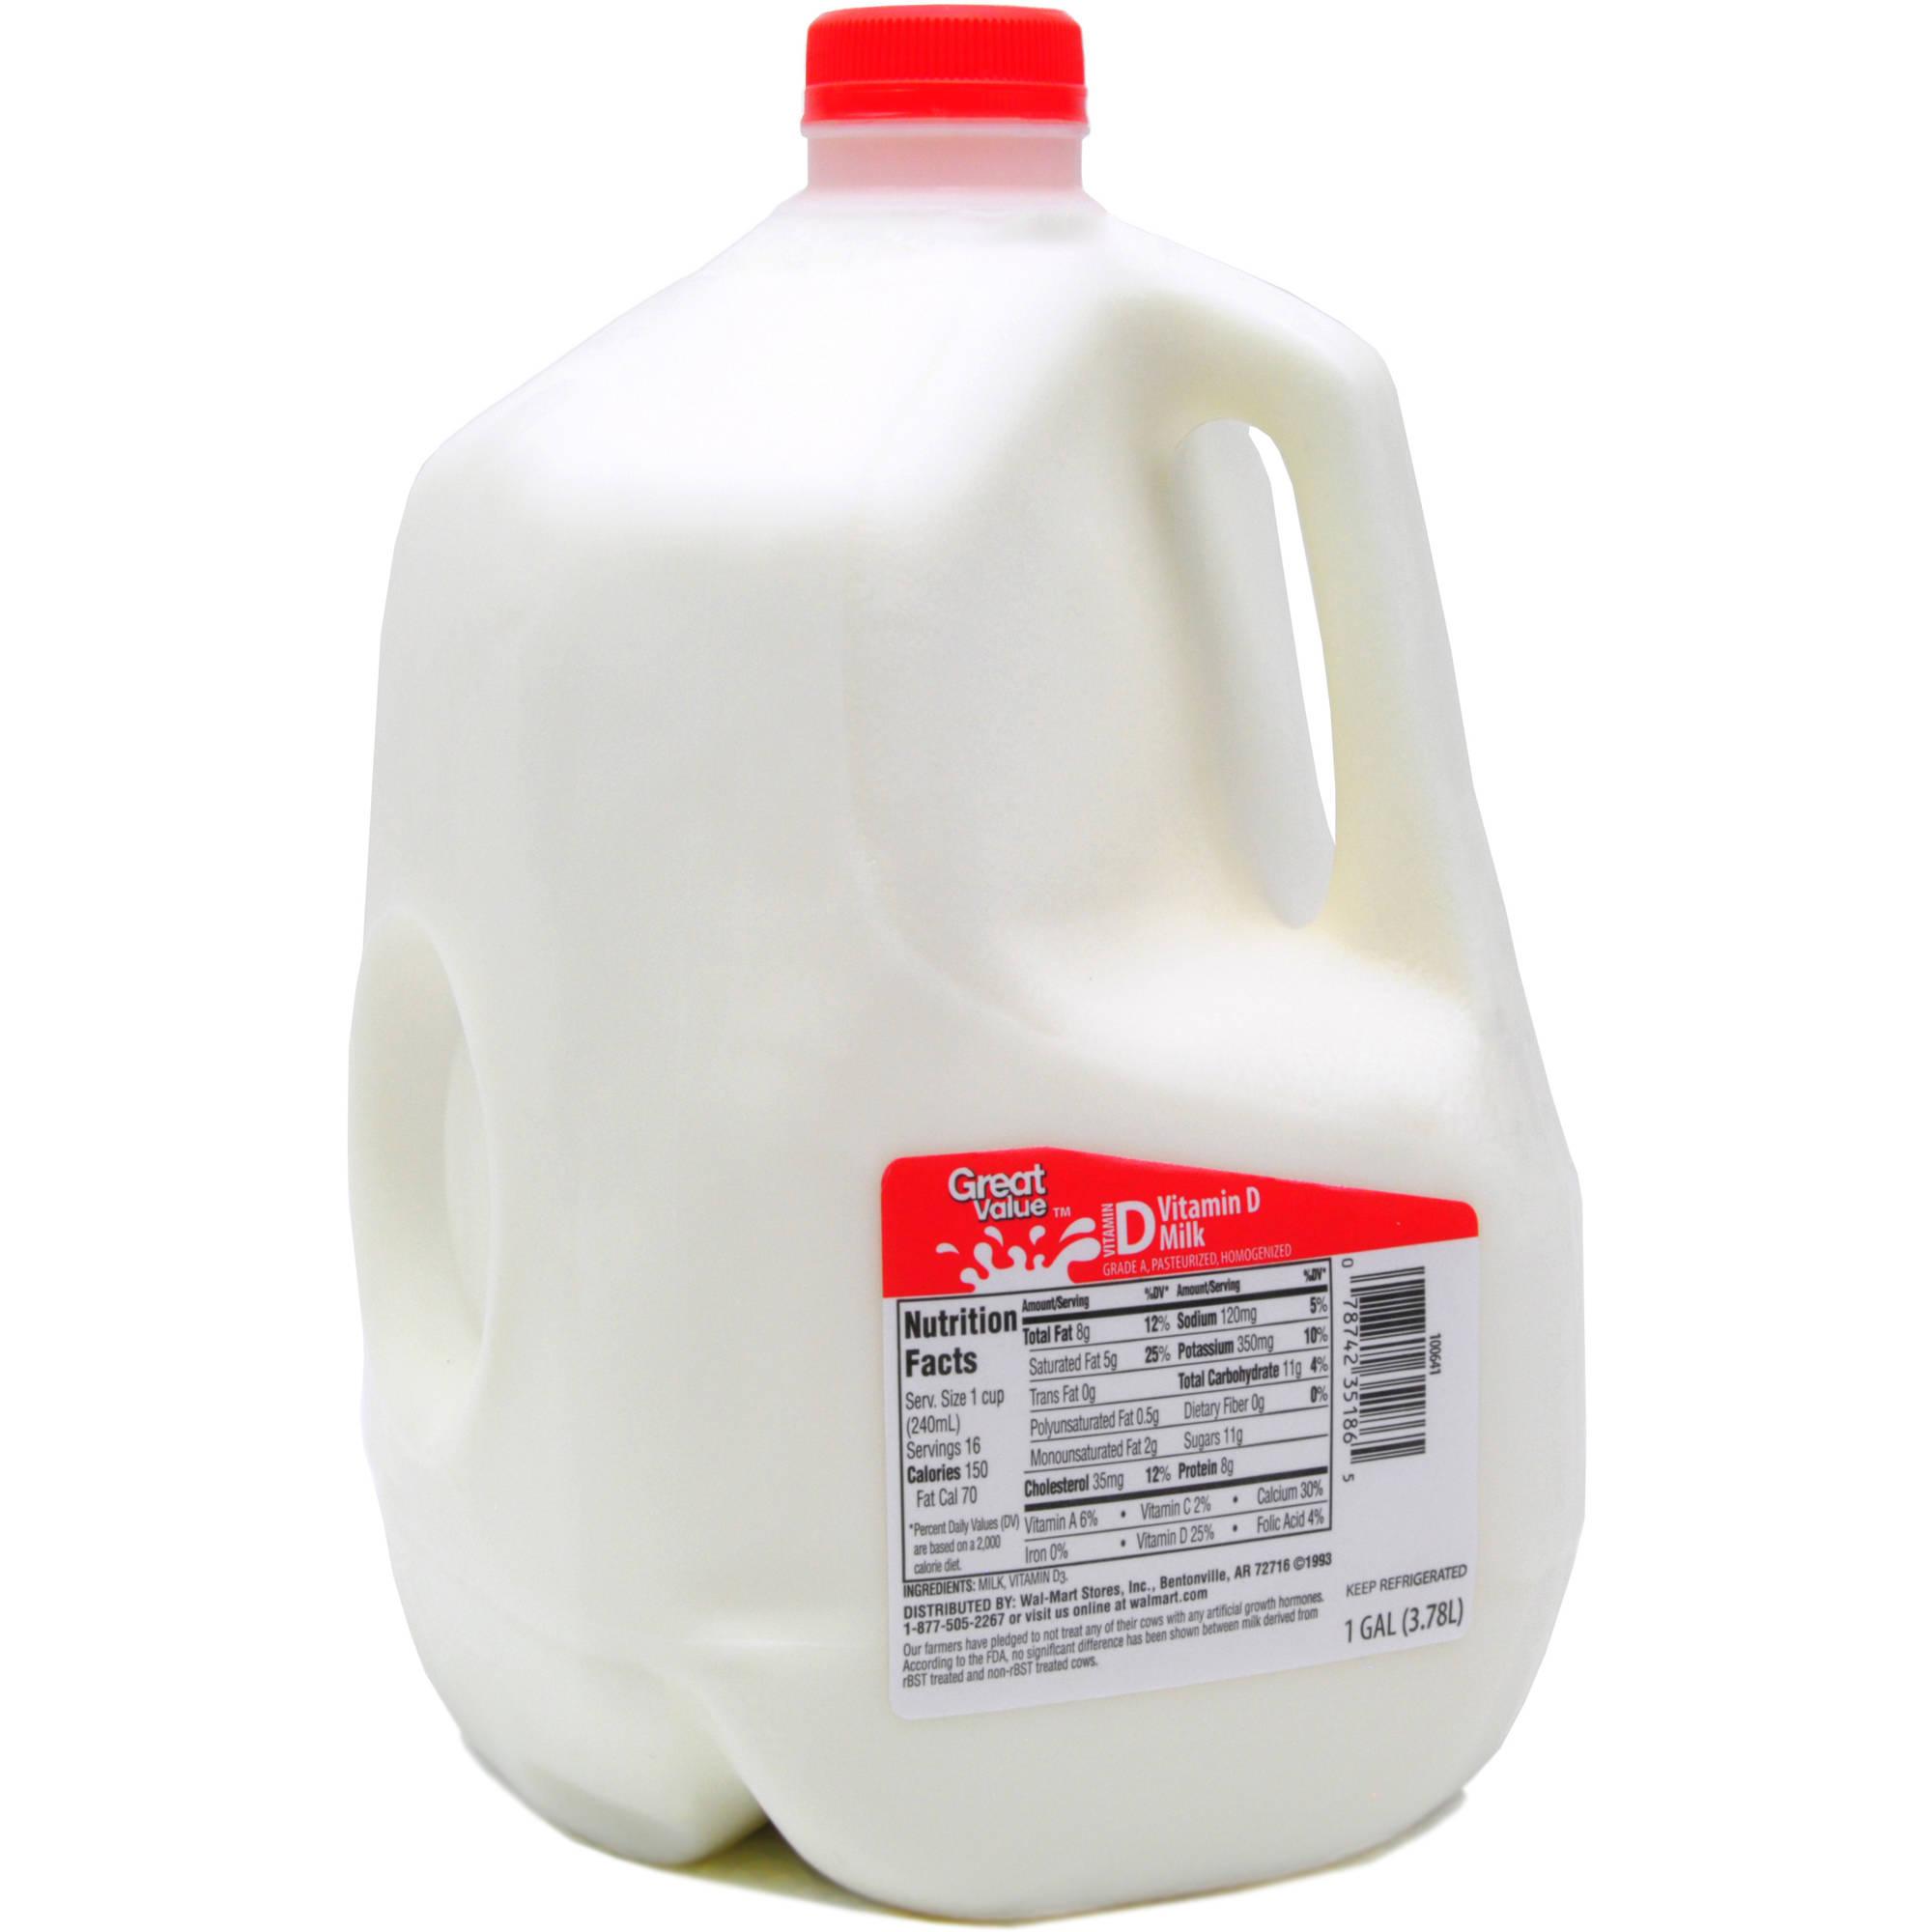 Great Value Vitamin D Milk, 1gal